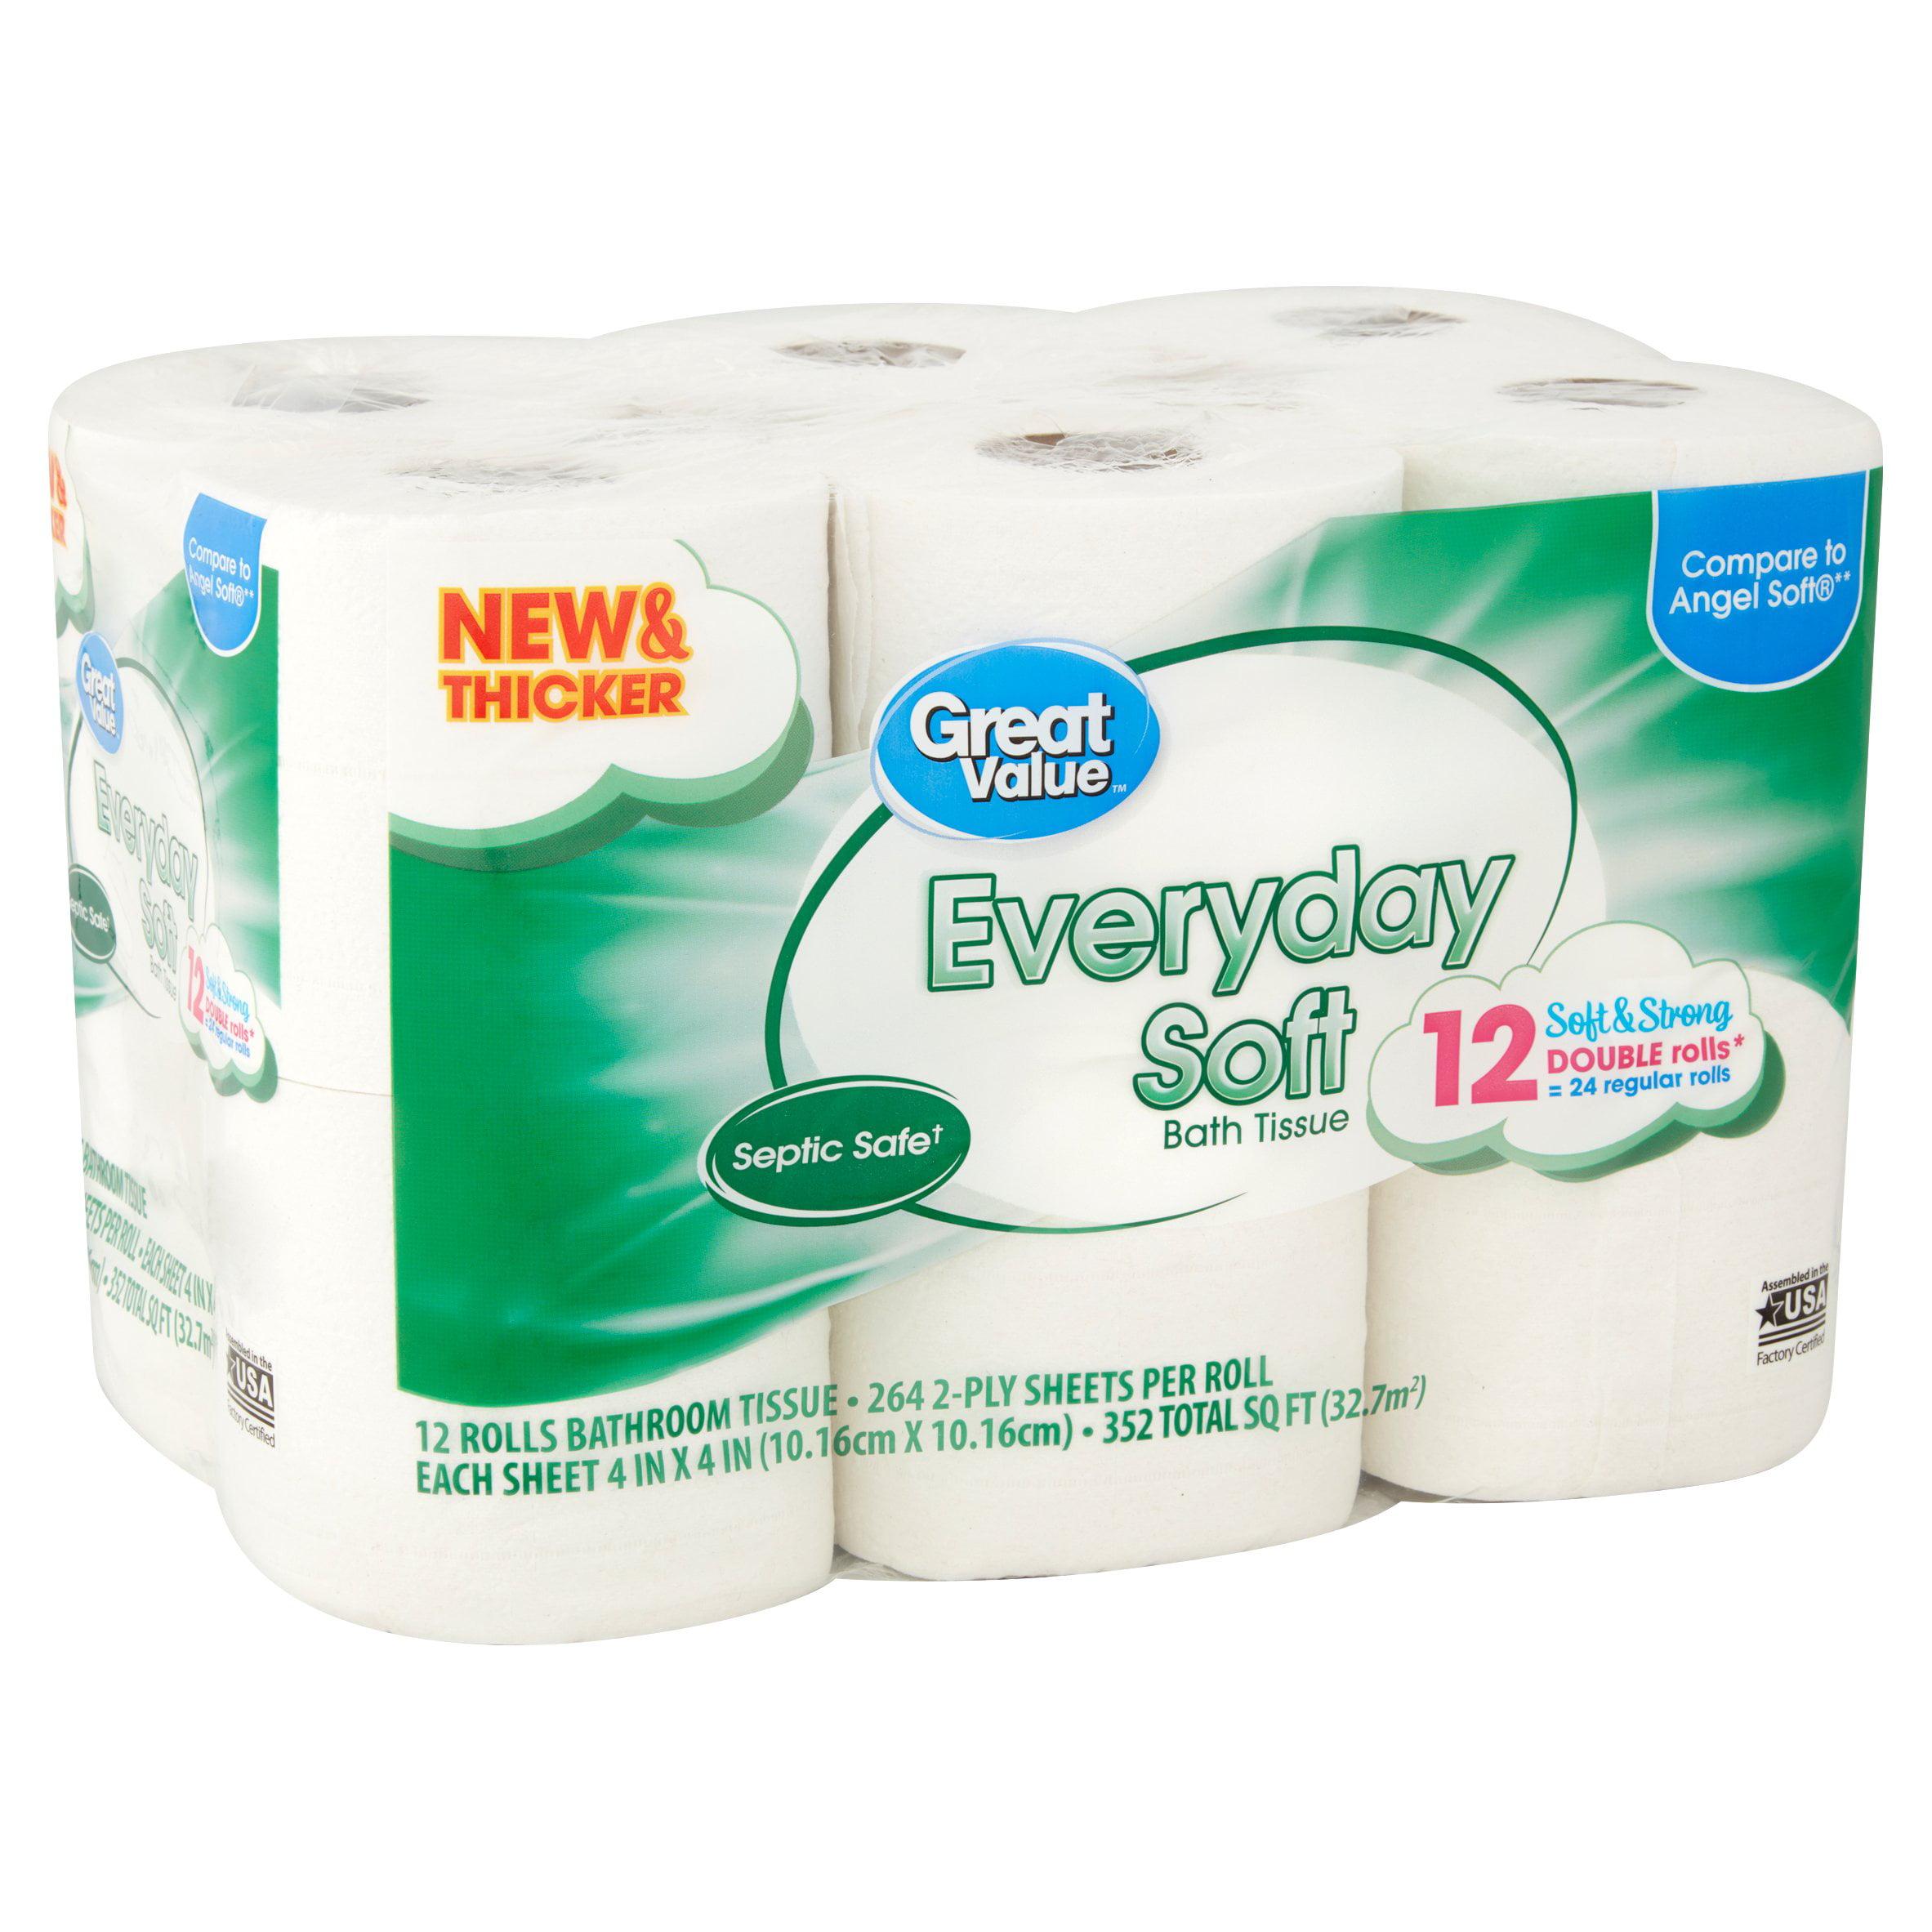 great value everyday soft rolls bathroom tissue 12 count walmartcom - Bathroom Tissue